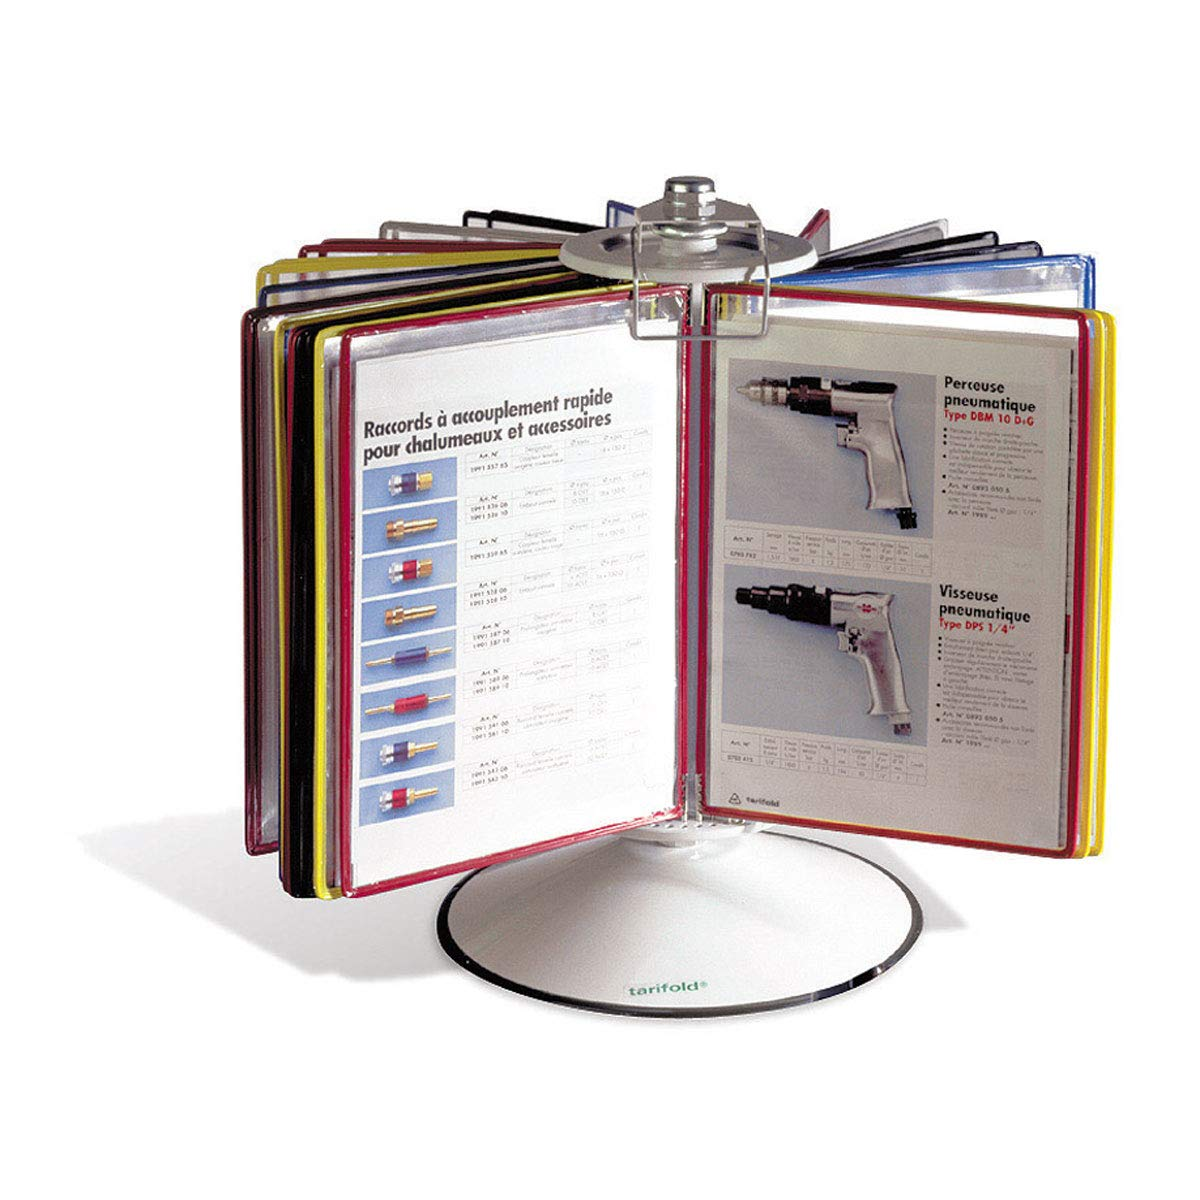 Tarifold Steel Rotary Reference Display with 50 Display Pockets, Gray Base,100 Sheet Capacity (R295)